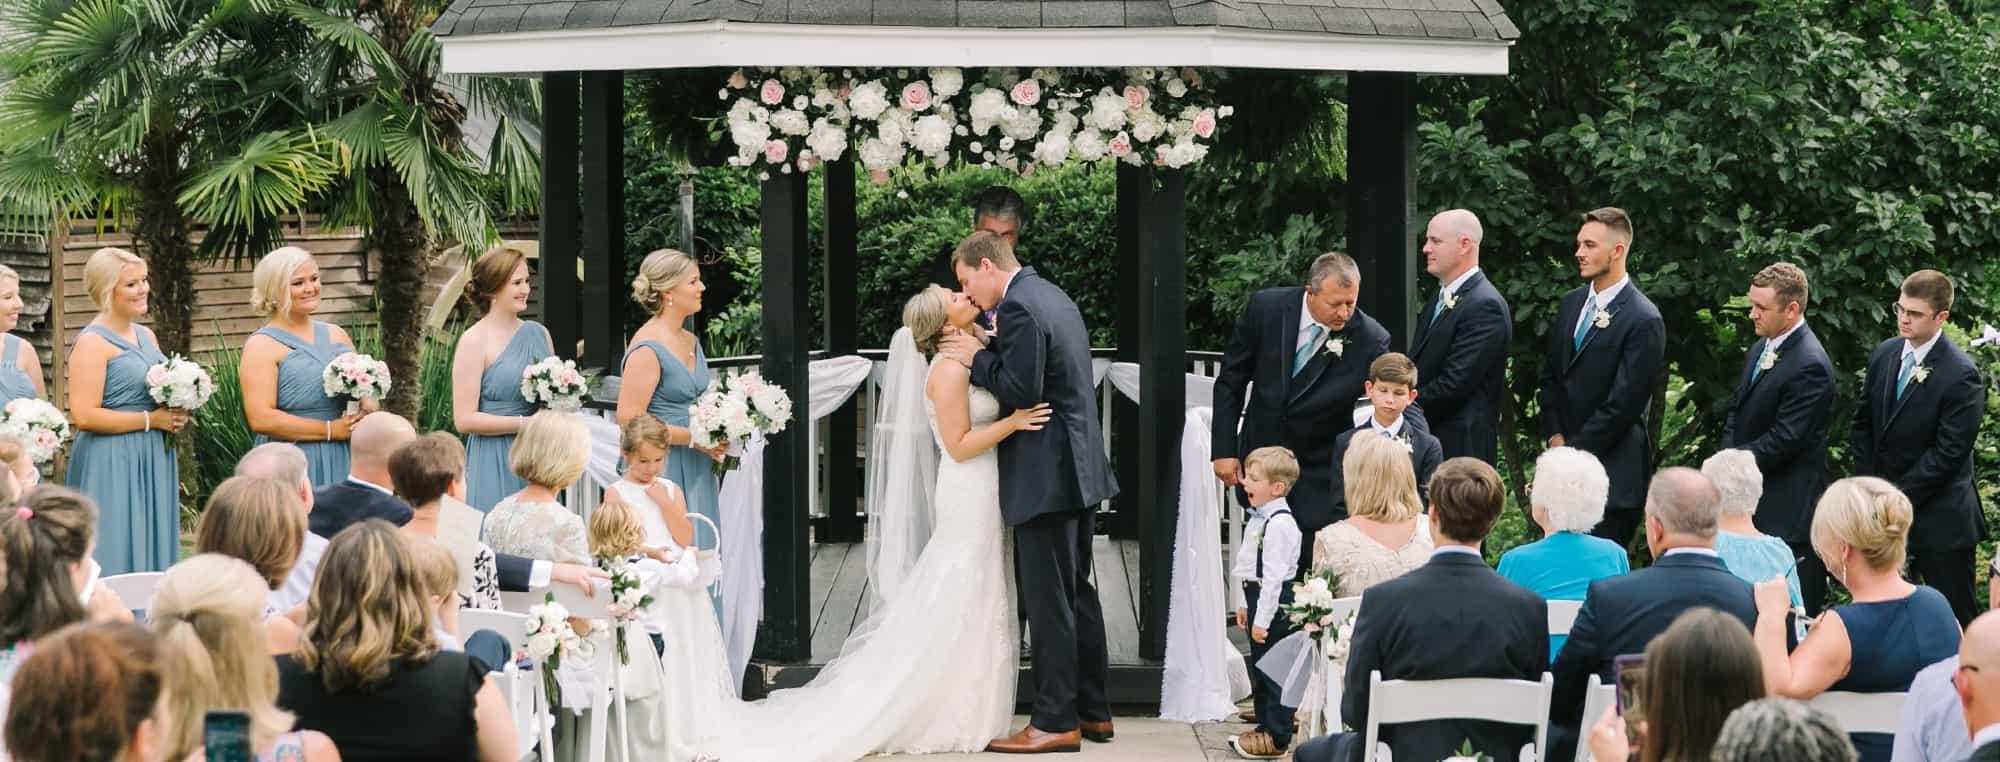 Wedding - Corley Mill House